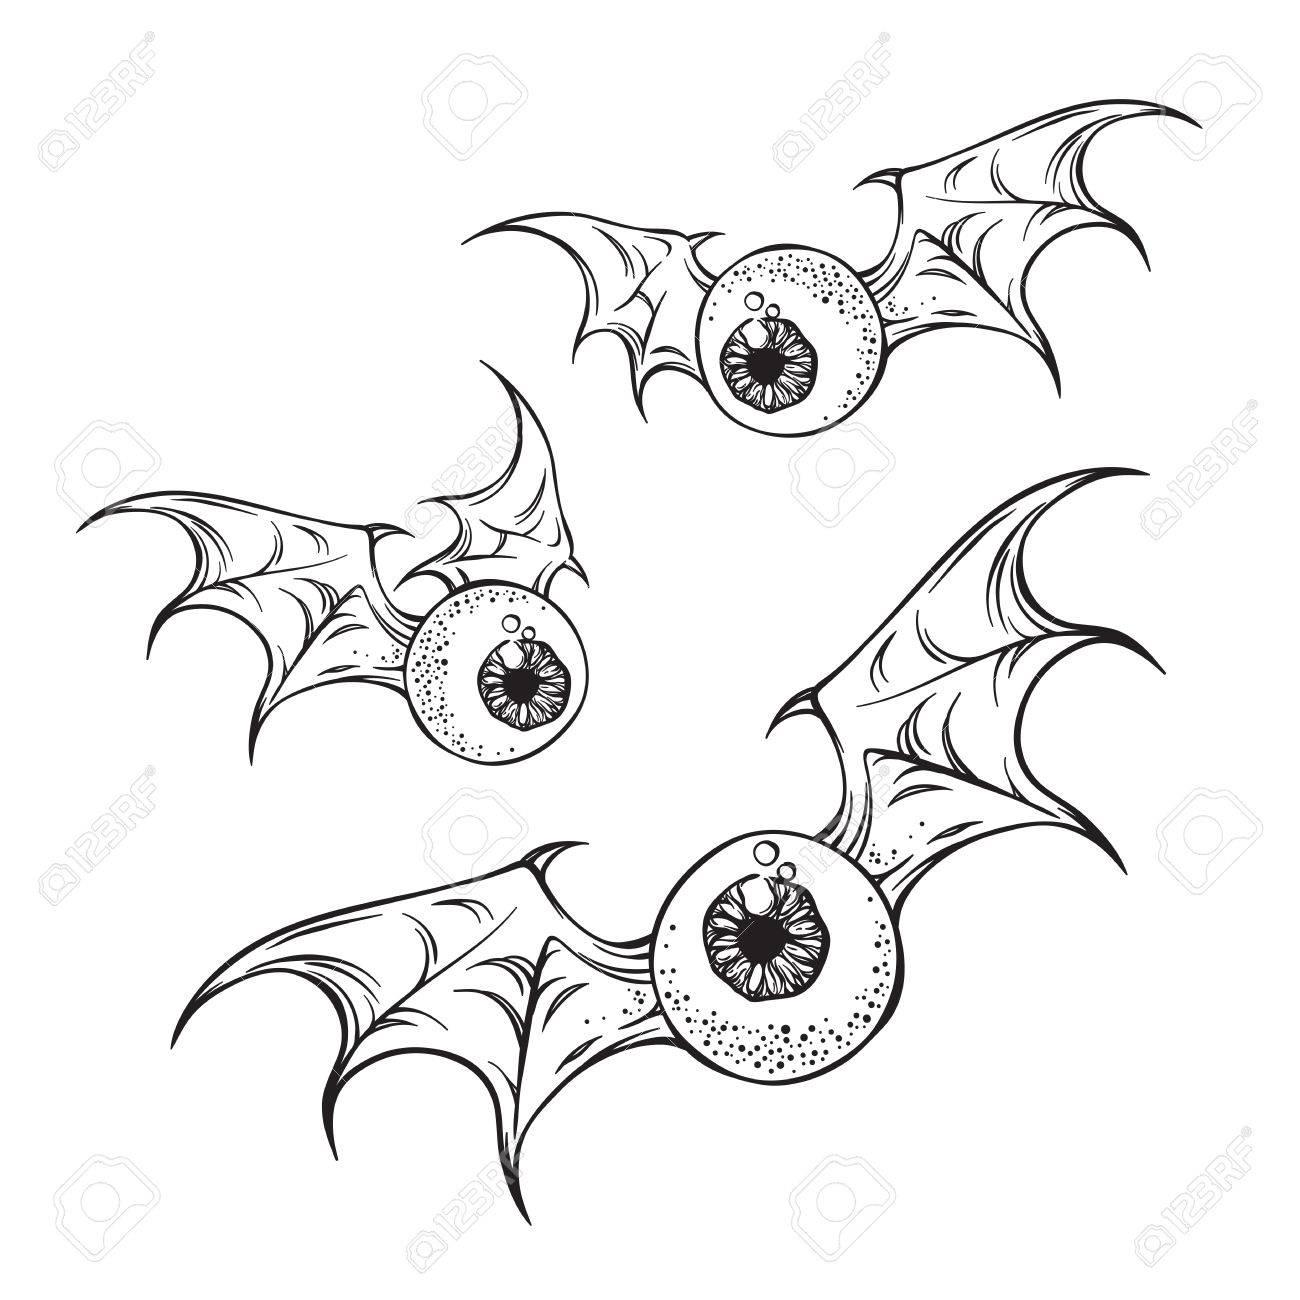 1300x1300 Flying Eyeballs With Creepy Demon Wings Black And White Halloween